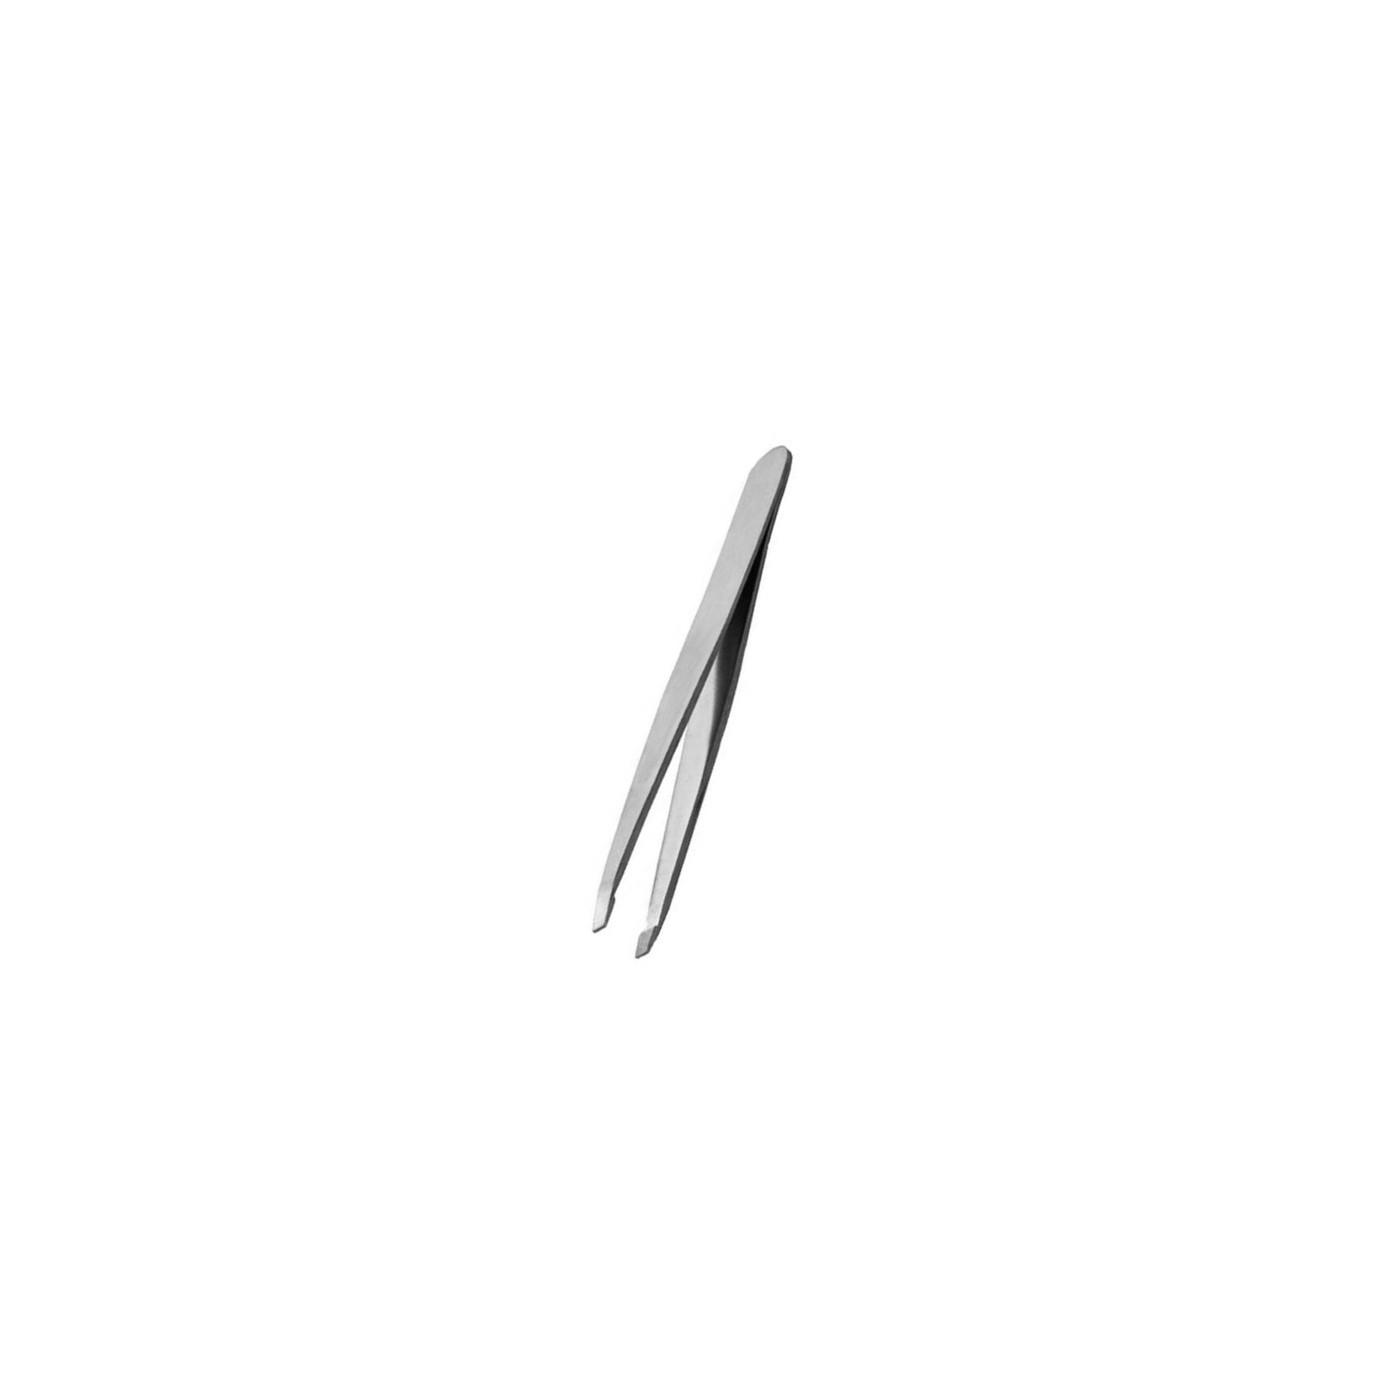 Pincettes en acier inoxydable (9 cm)